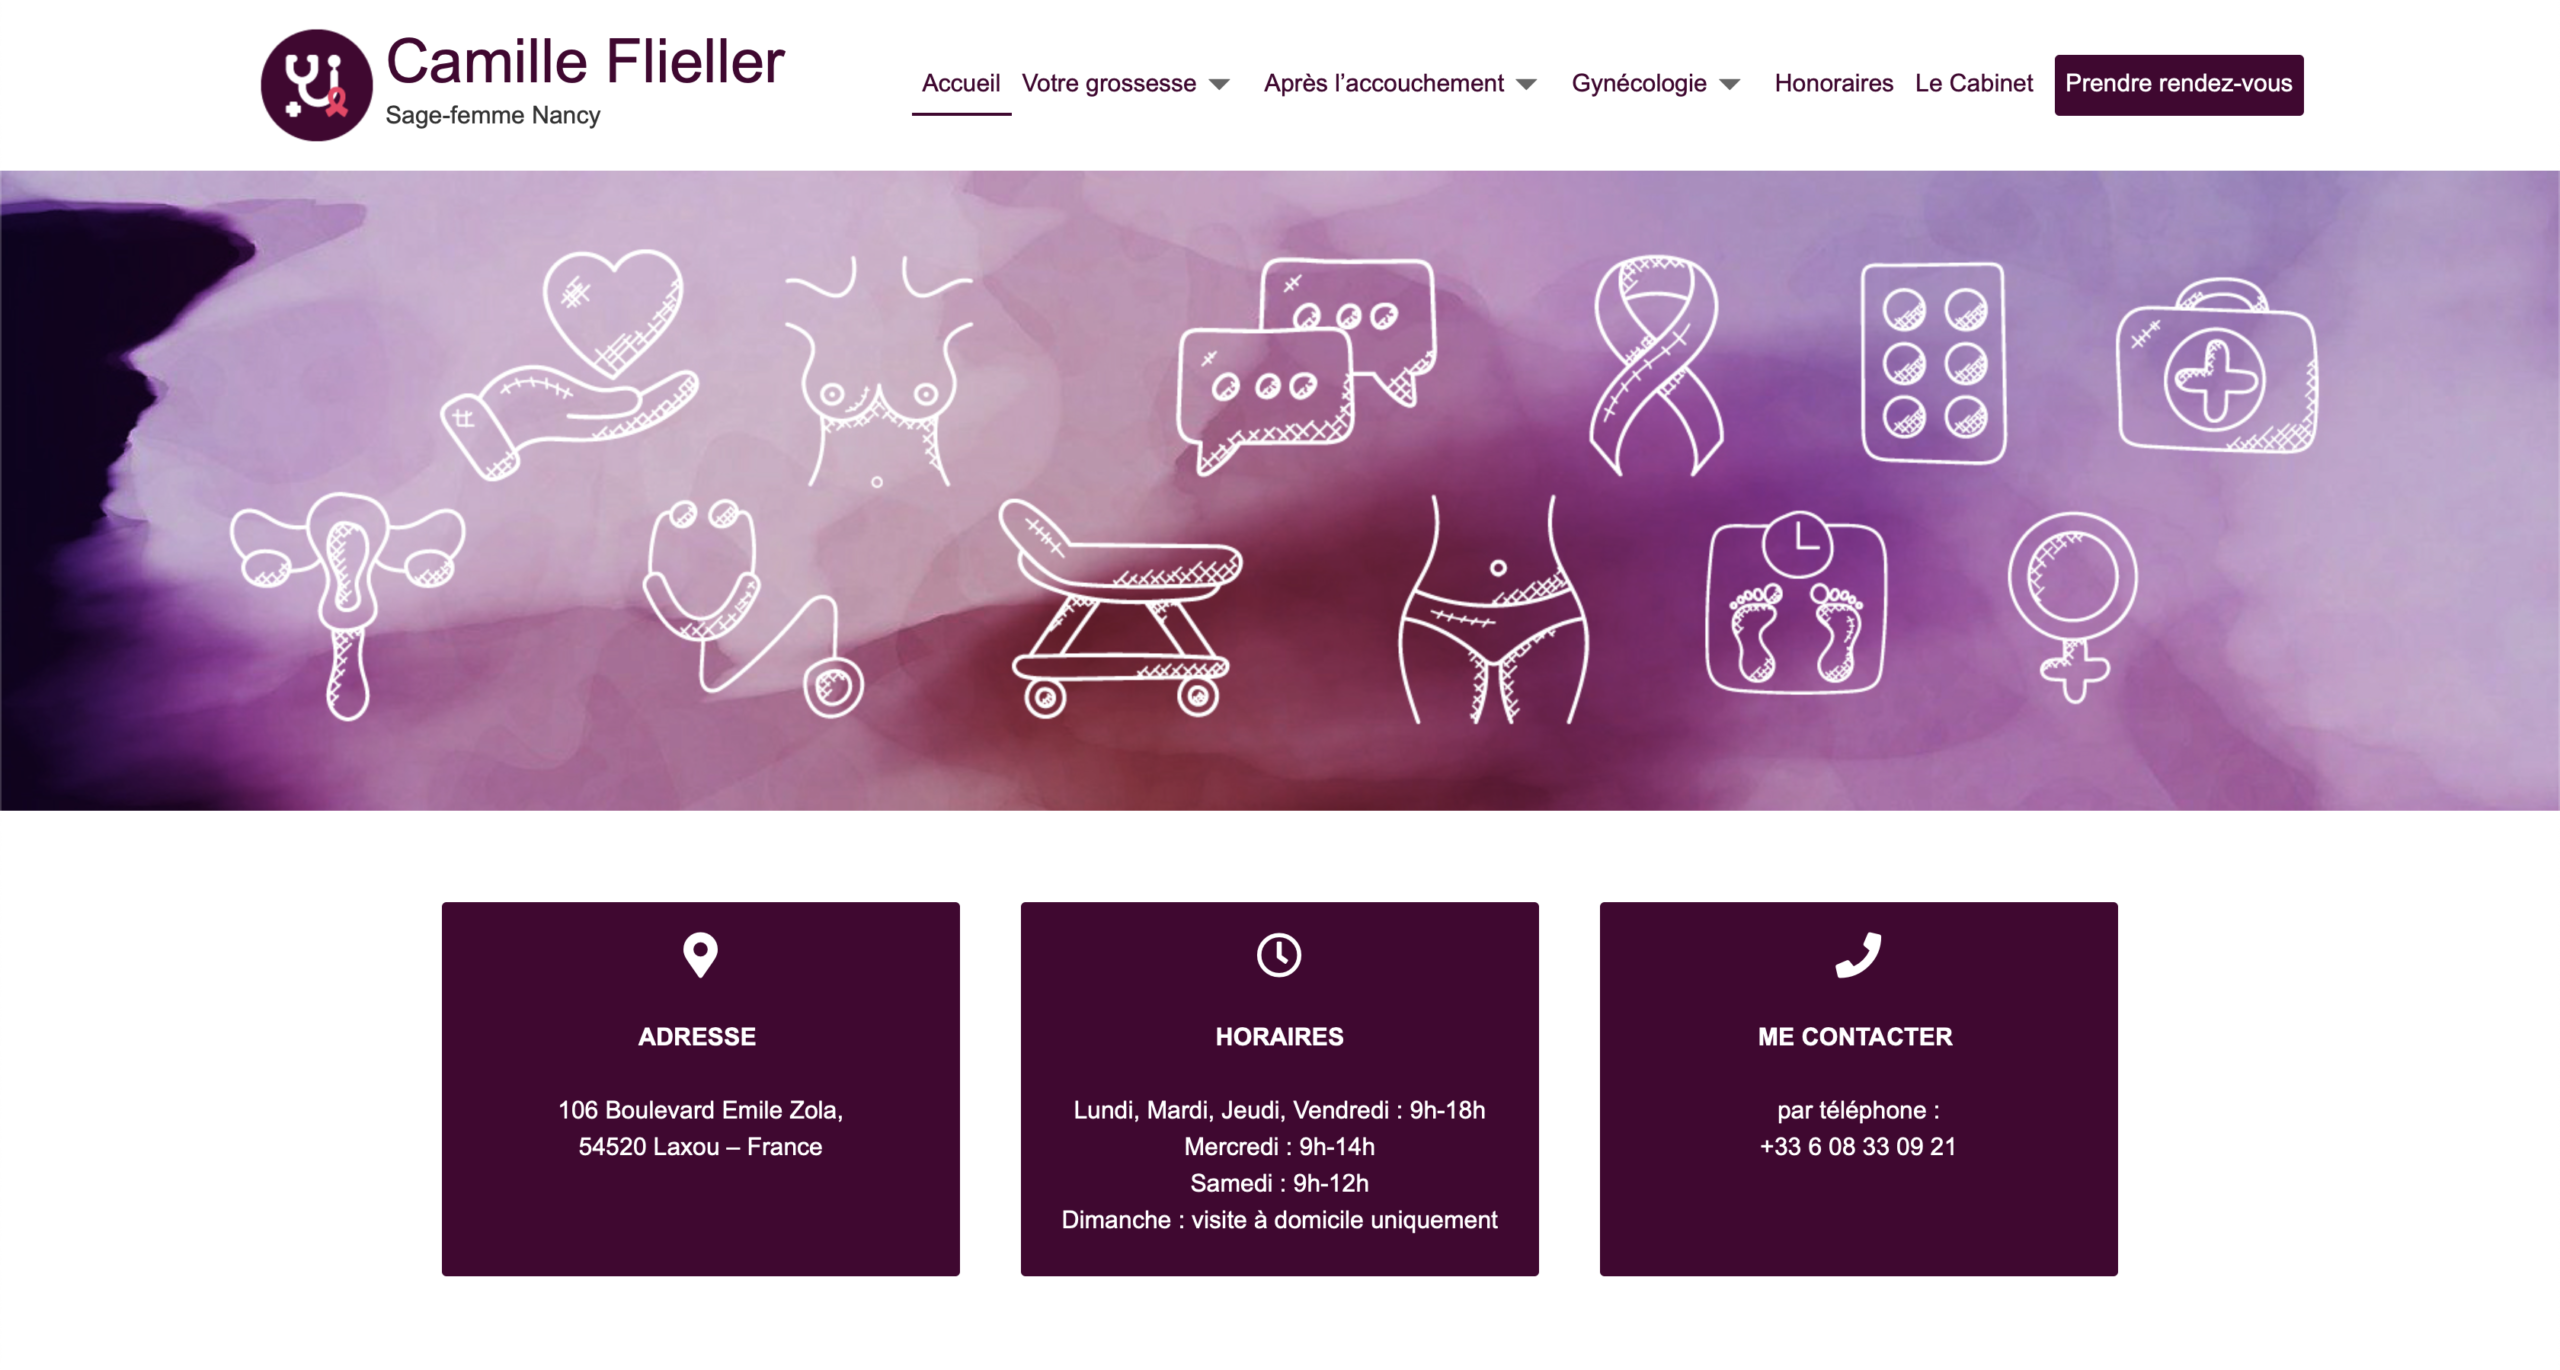 Camille Flieller | Sage femme Nancy - Réalisation 2019 - Webdesign - Matthieu Loigerot